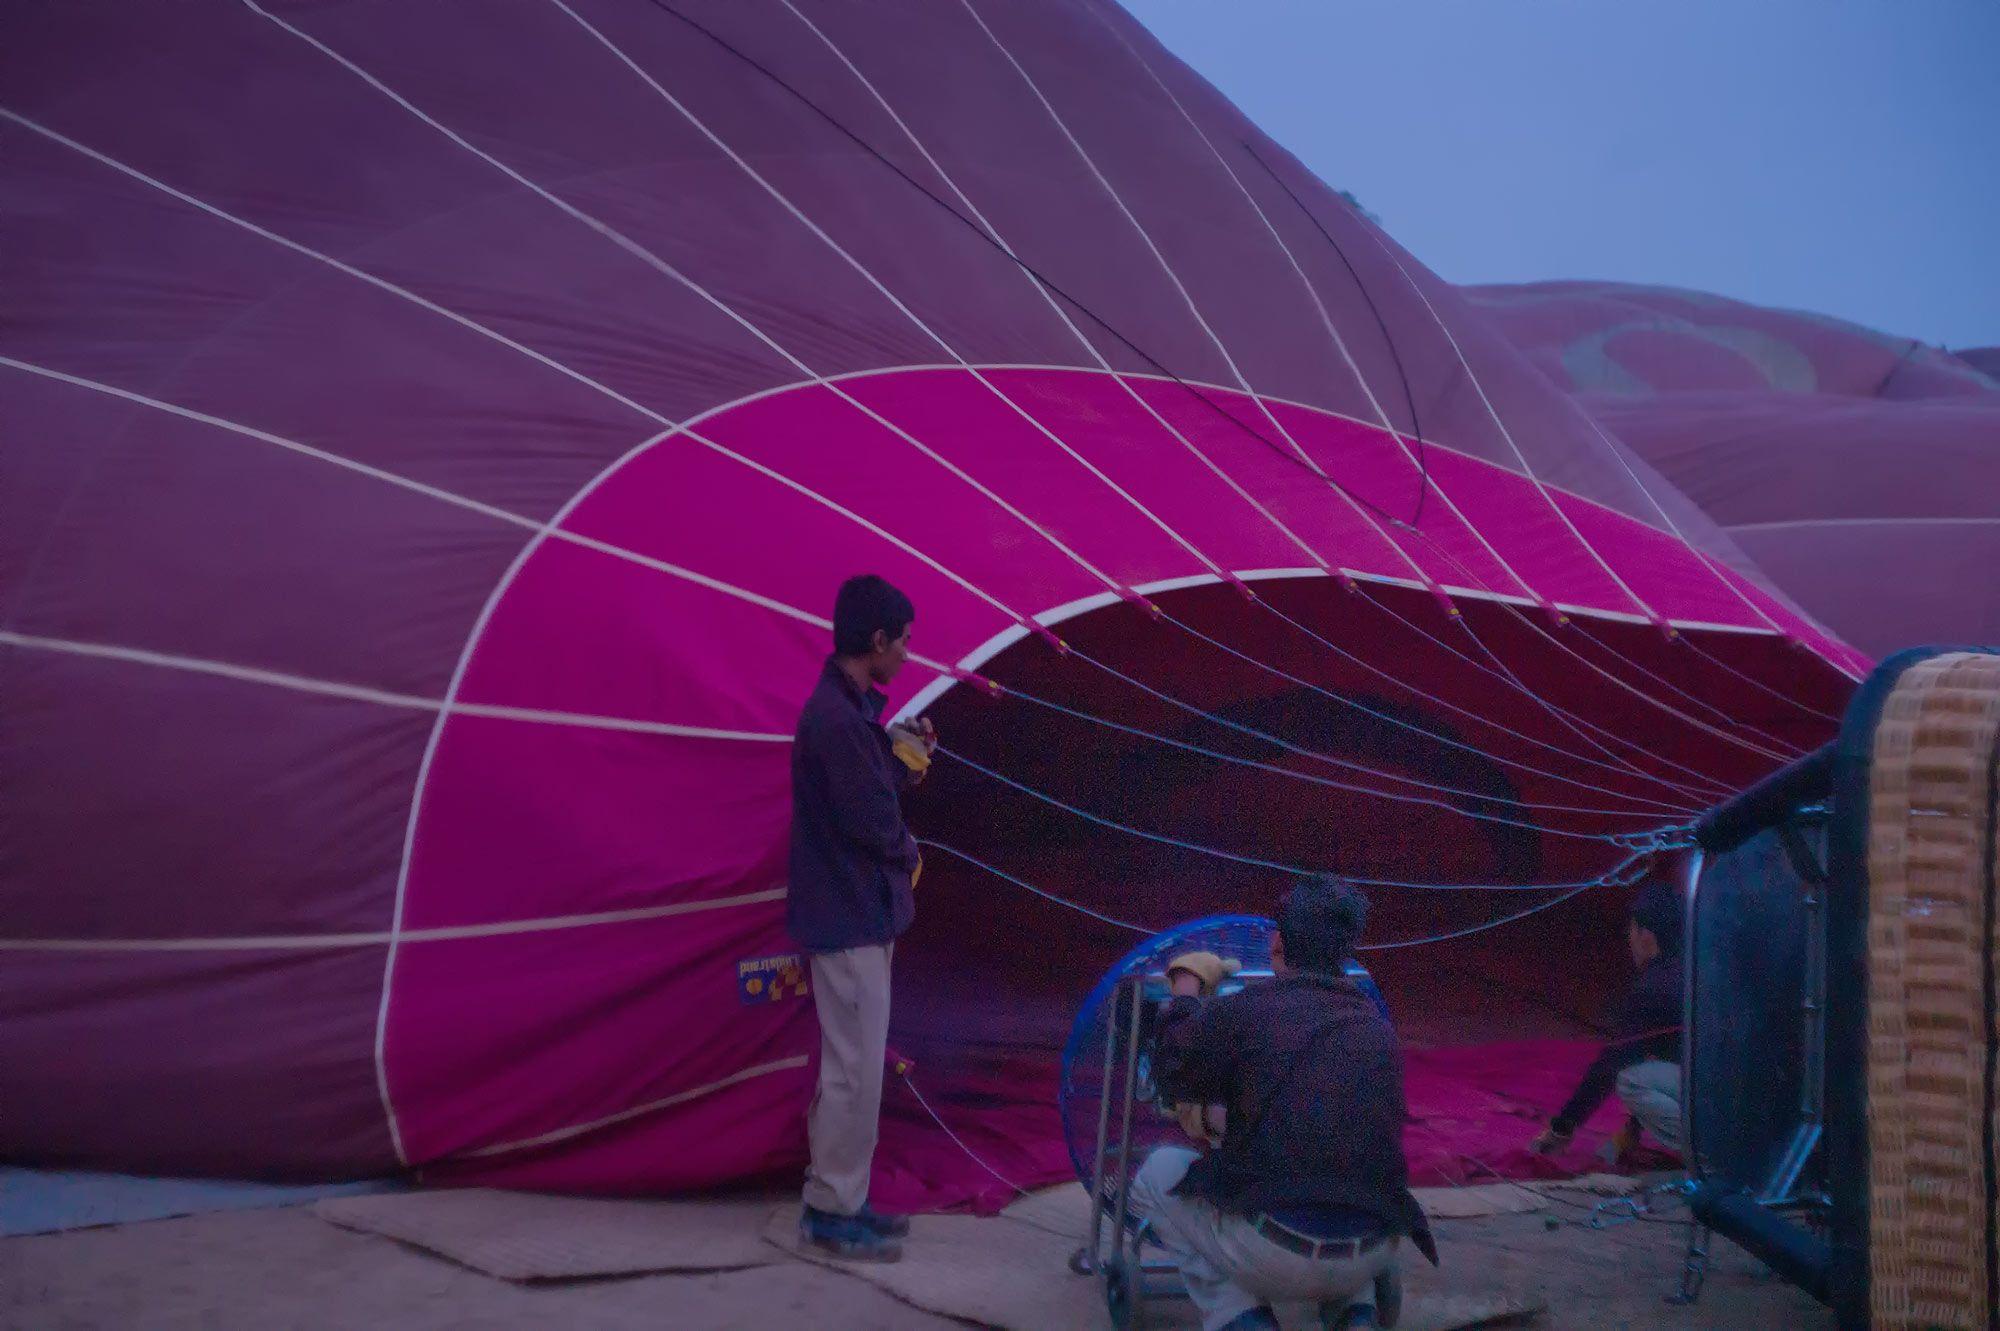 Heißluftballon wird aufgeblasen